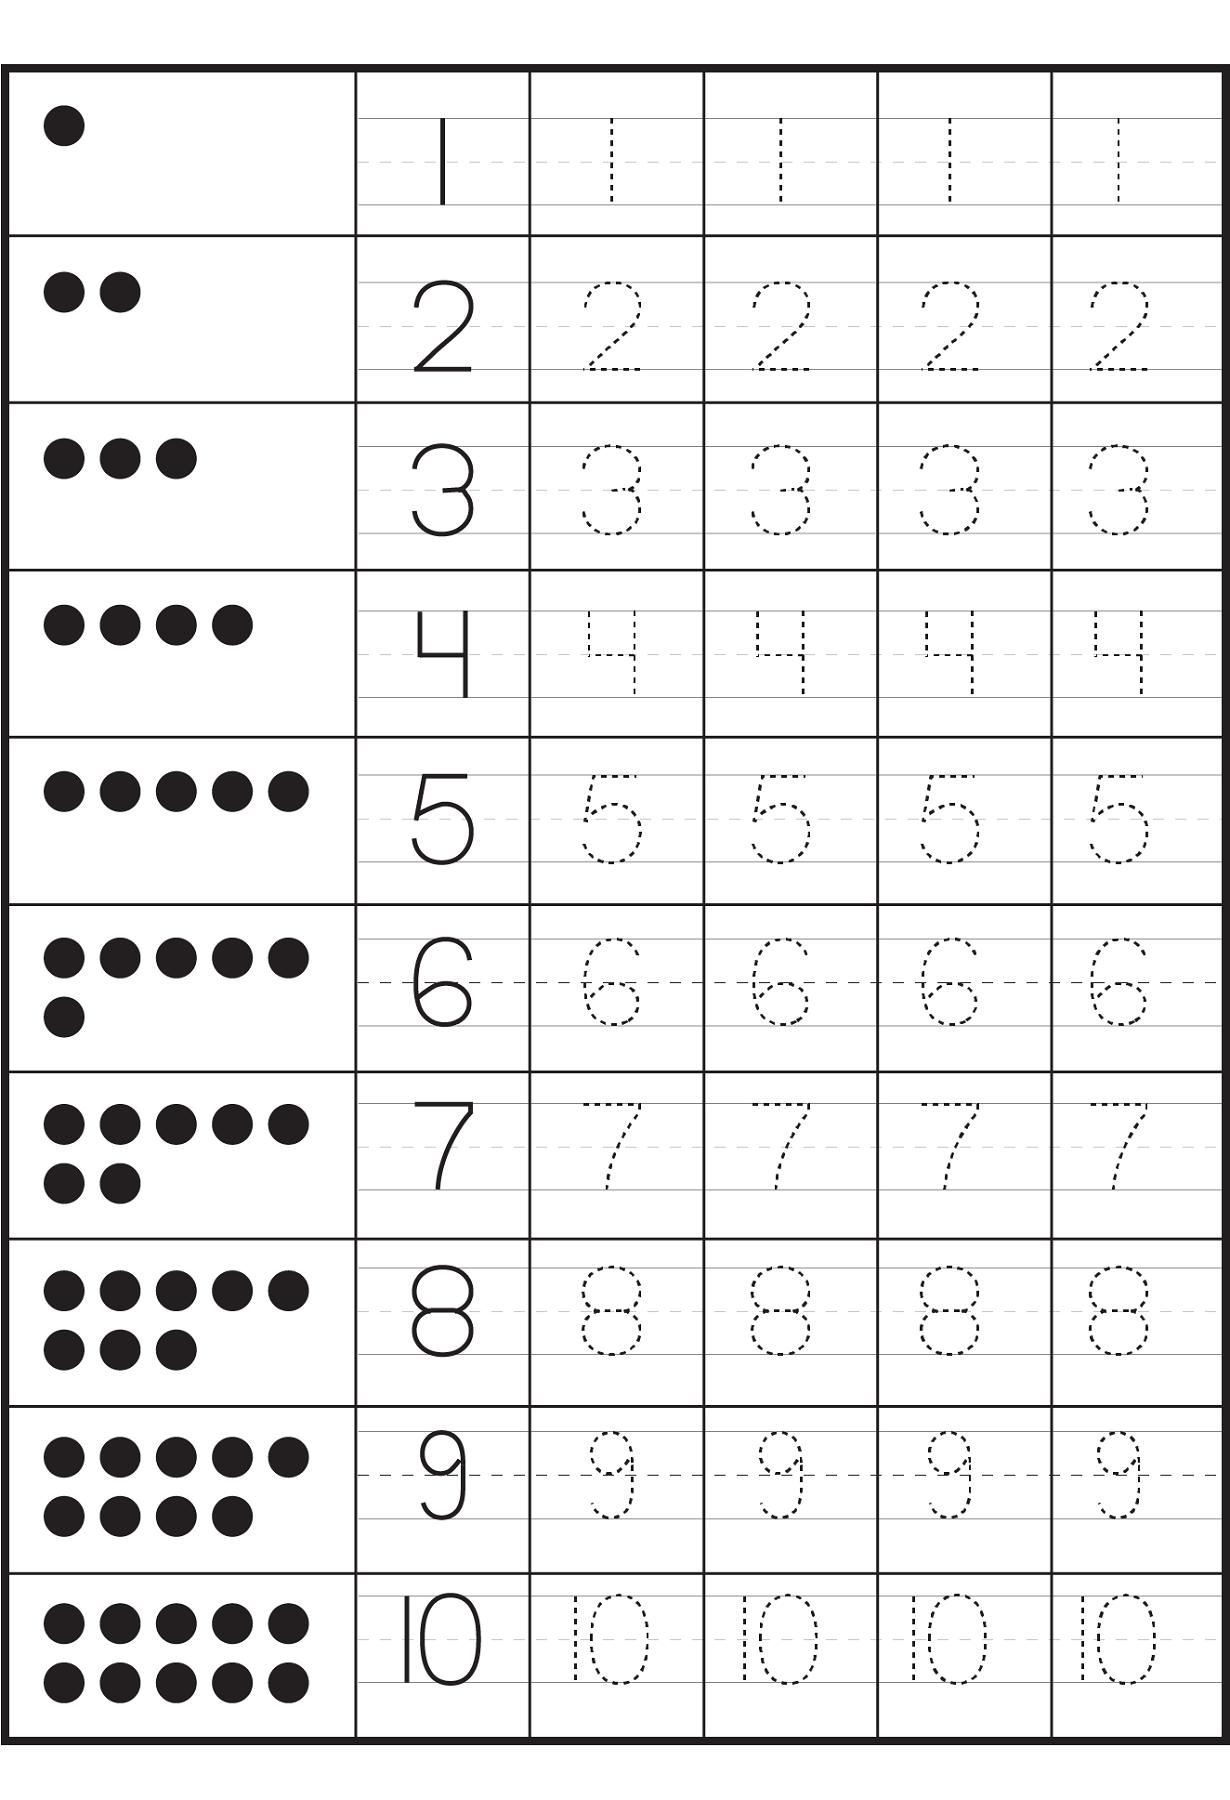 Image Result For Trace Numbers 1 10 Numbers Kindergarten Writing Practice Worksheets Number Worksheets Kindergarten [ 1800 x 1230 Pixel ]